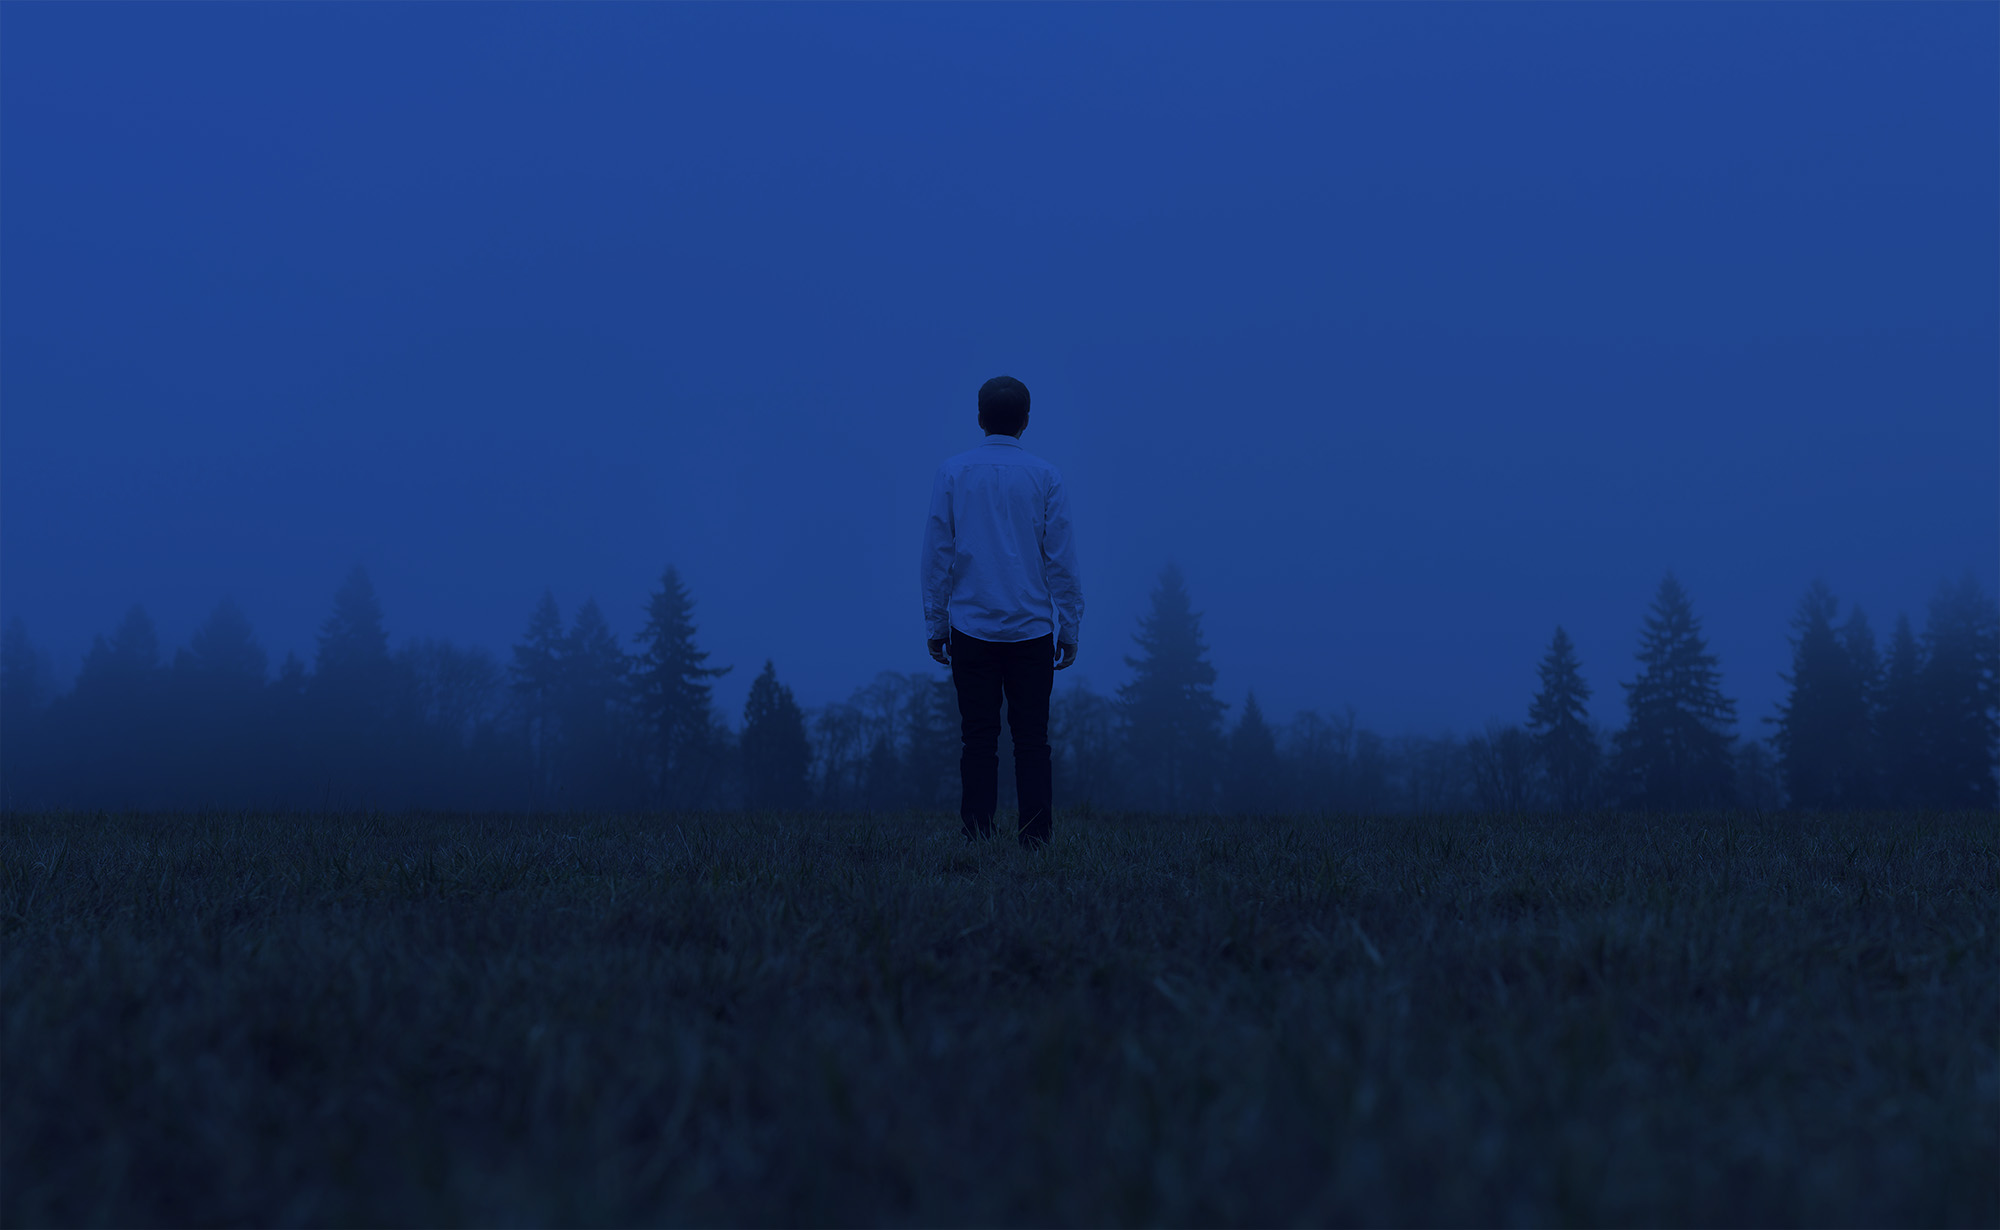 Frygten – din destruktive følgesvend